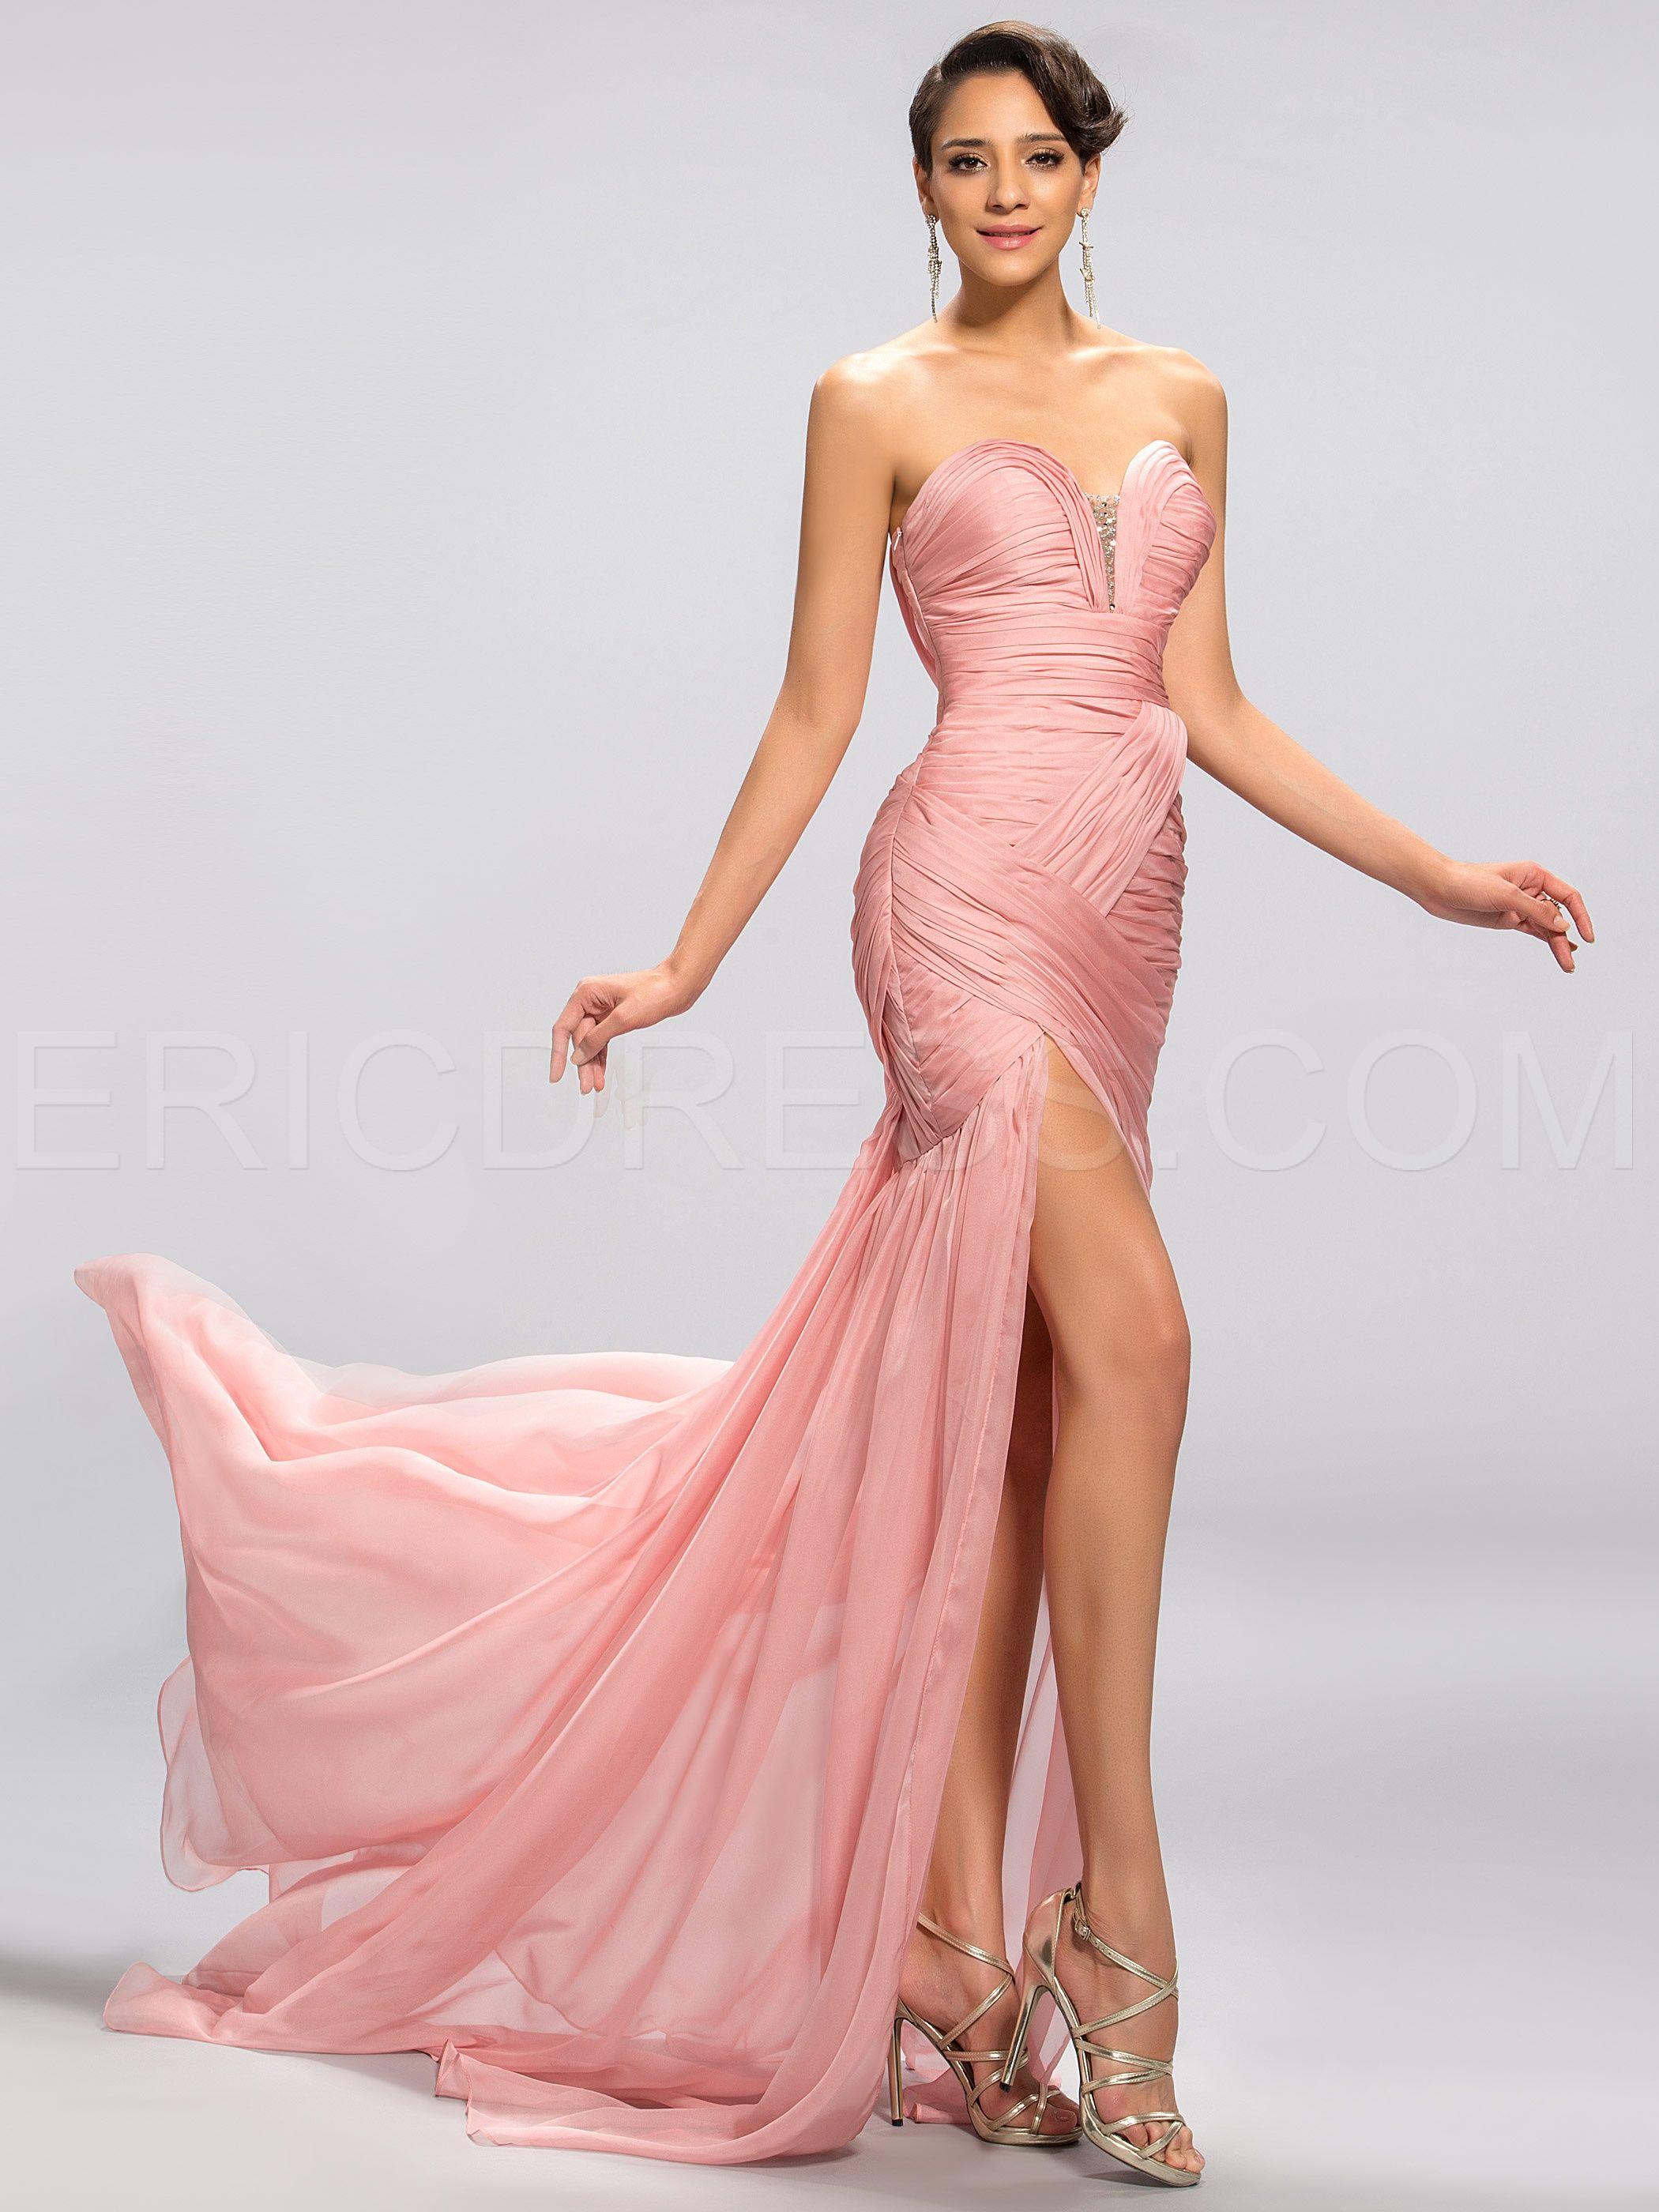 Increíble Jessica Mcclintock Vestidos De Fiesta Motivo - Colección ...